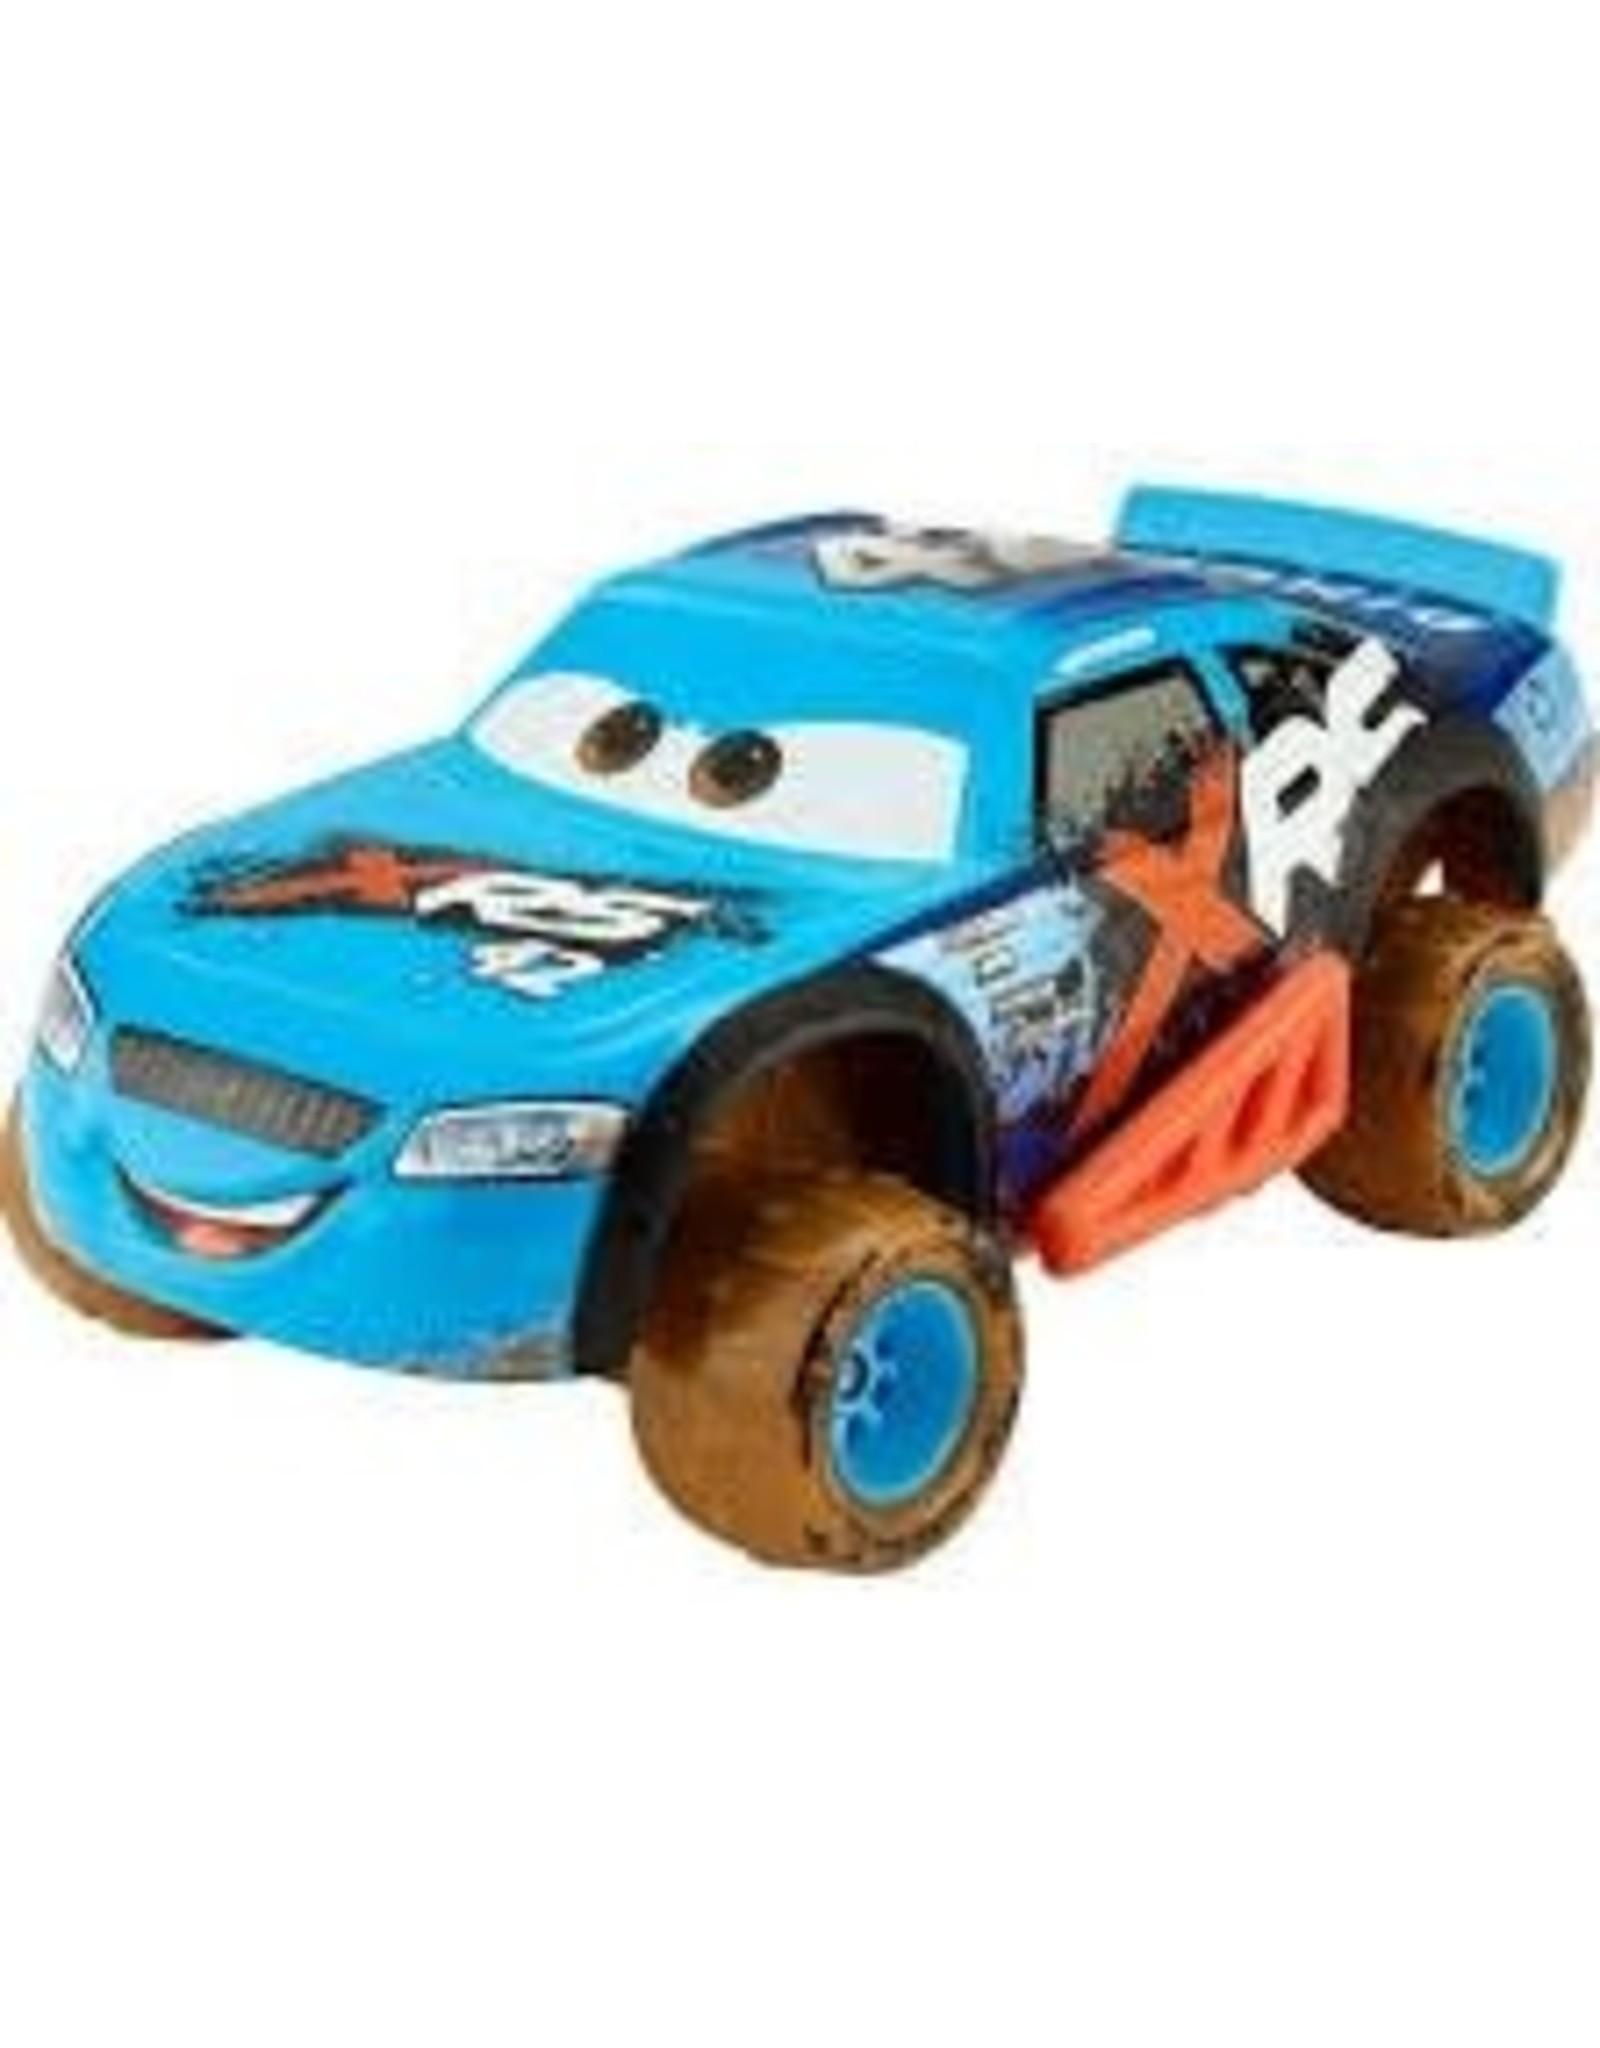 Mattel Cars XRS Mud Racing Cal Weathers